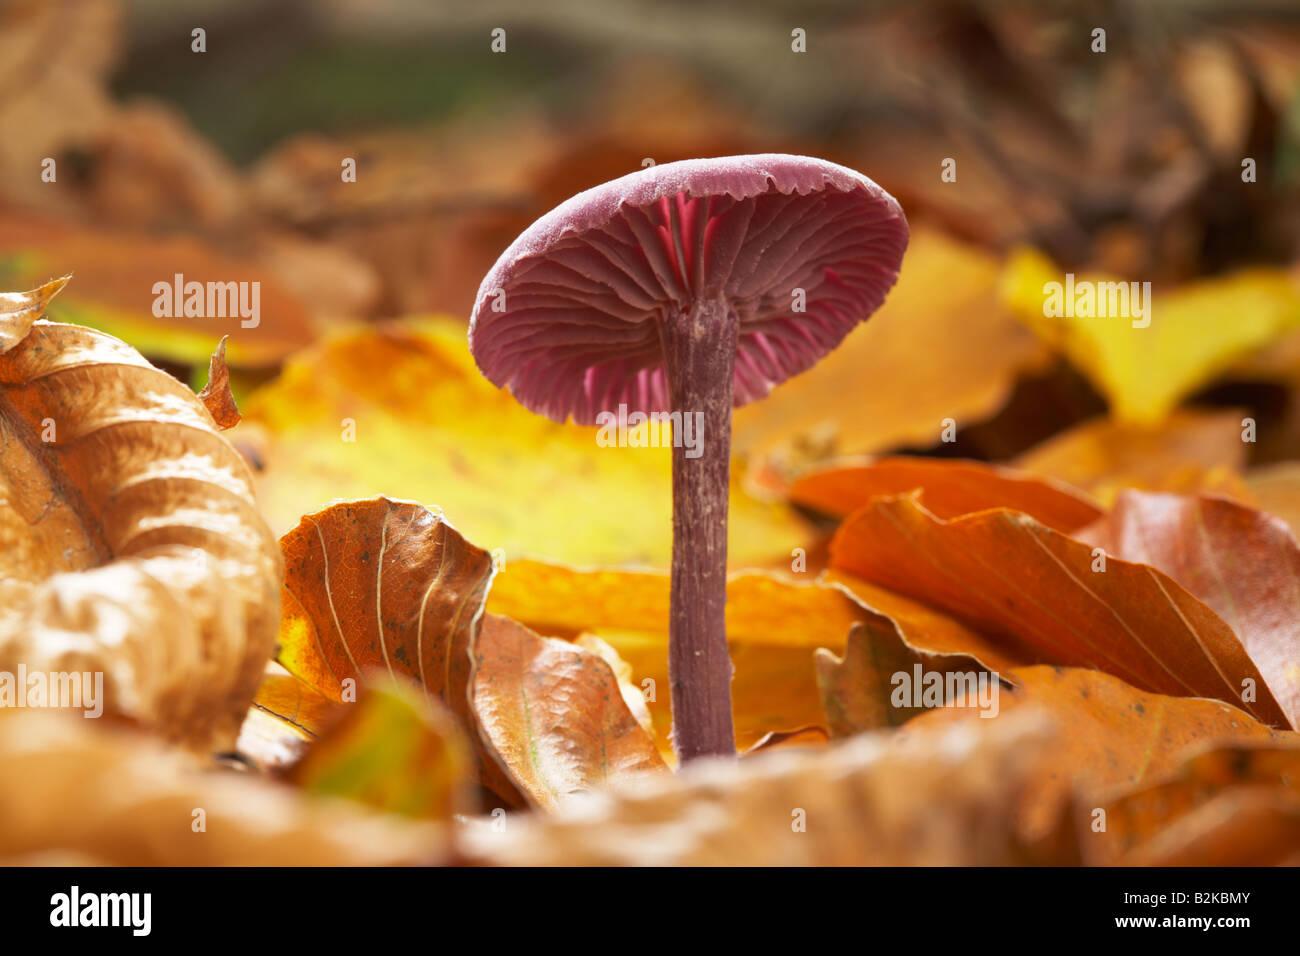 Purple Amethyst deceiver fungi - Stock Image